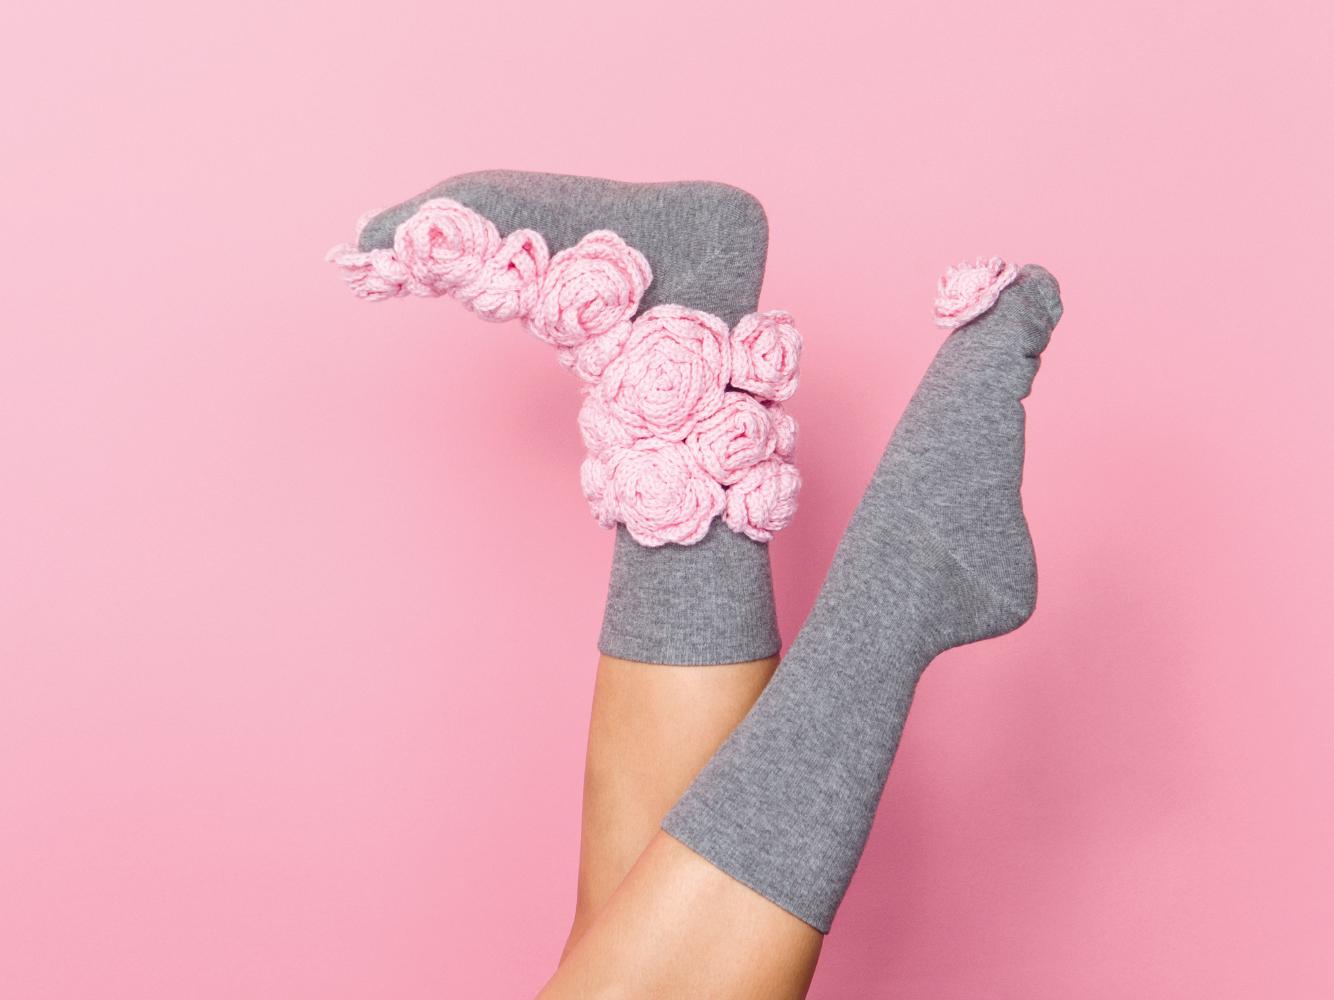 frankie magazine socks editorial magazine editorial styling art direction